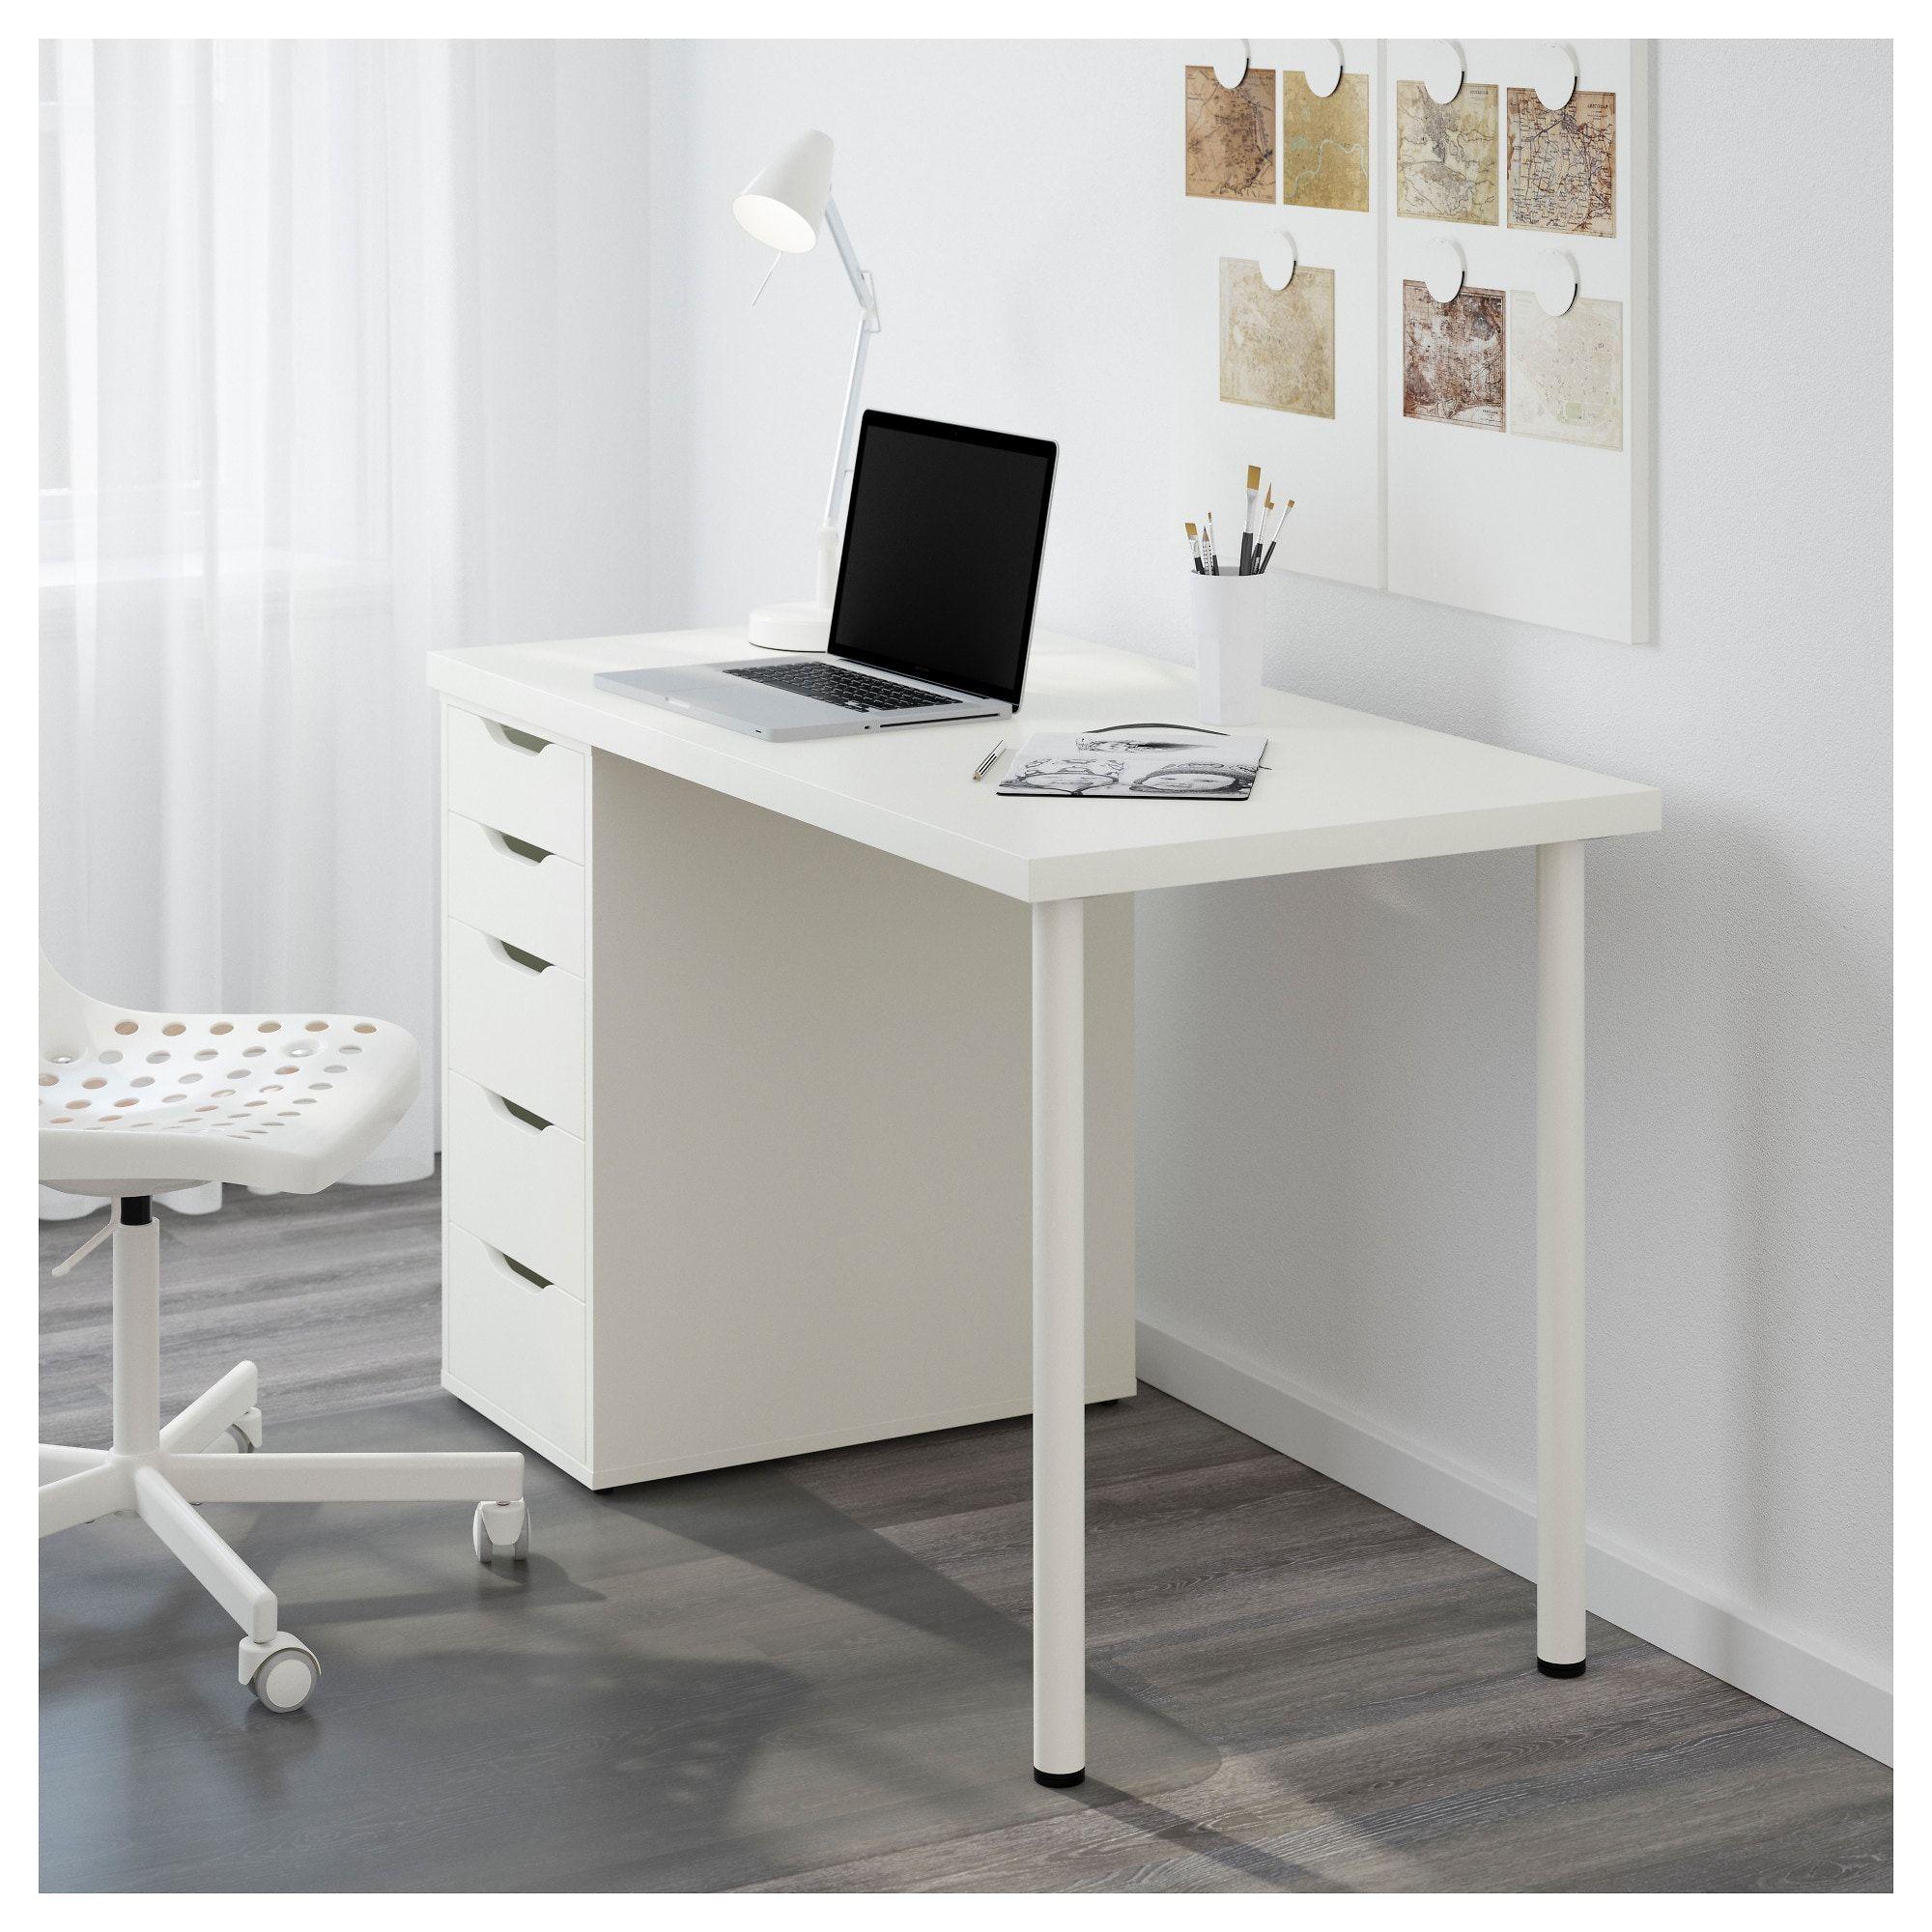 Linnmon Alex Table White 47 1 4x23 5 8 Ikea White Bedroom Furniture Bedroom Decor Design Remodel Bedroom